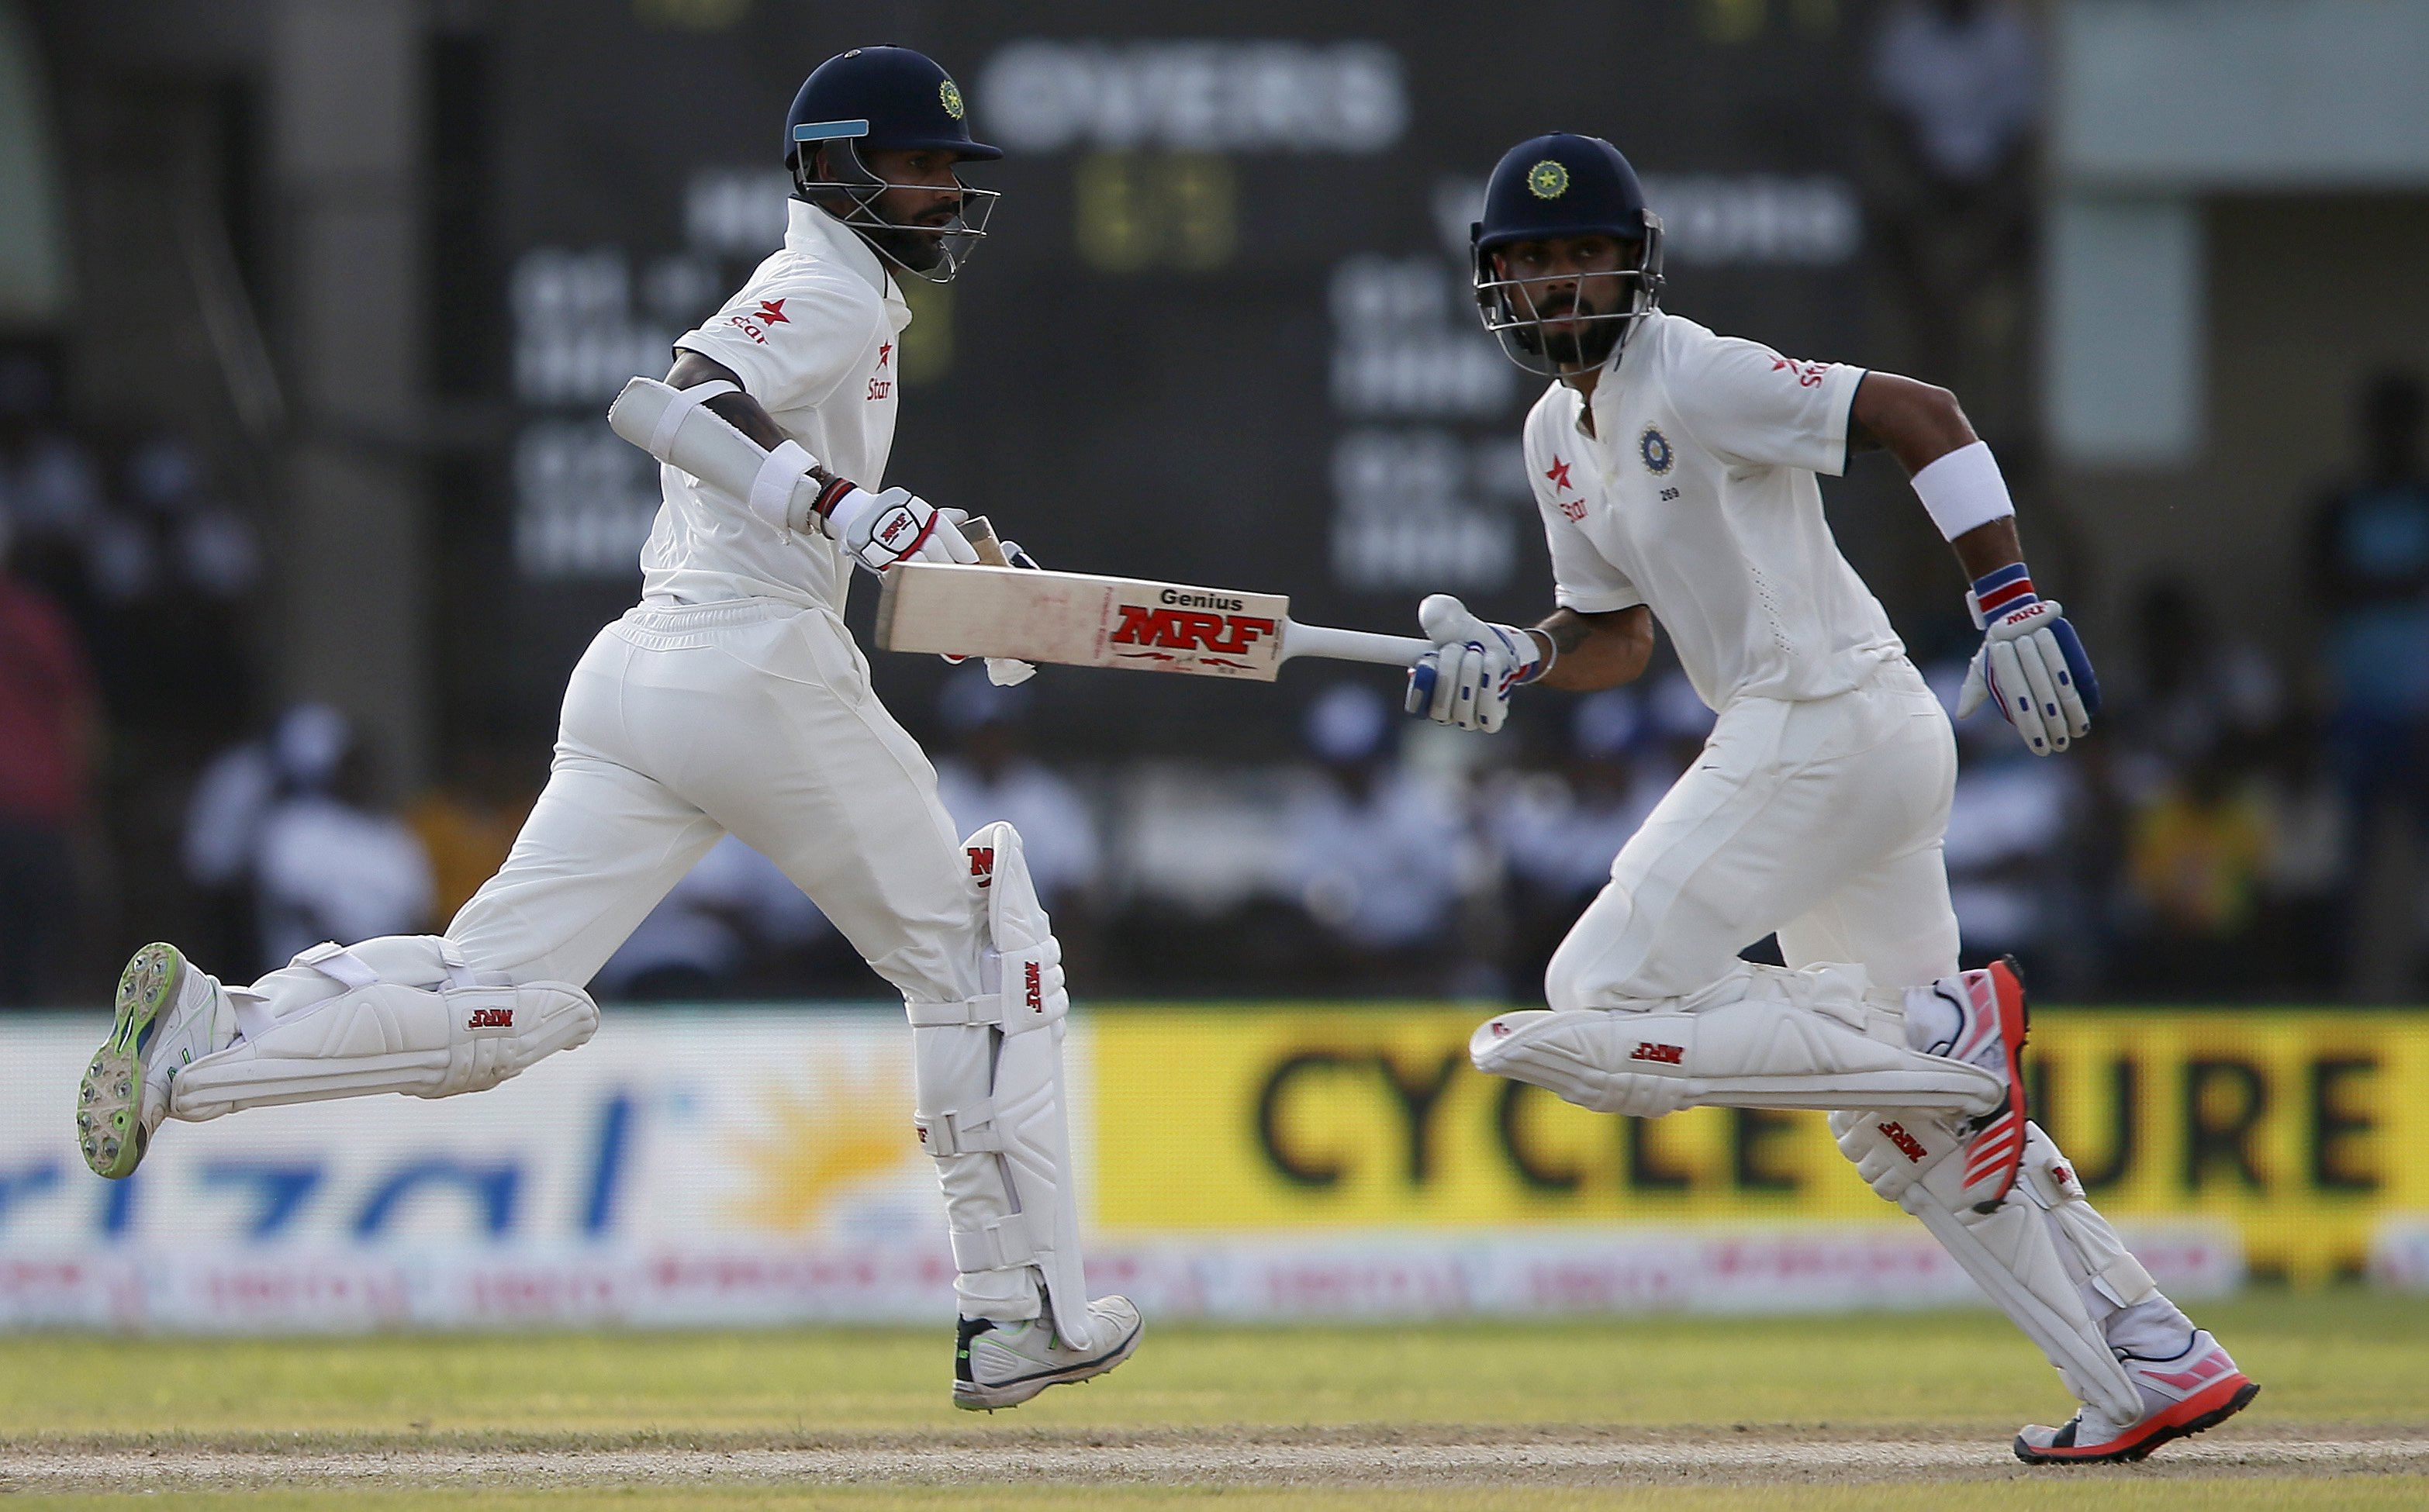 India's captain Virat Kohli and Shikhar Dhawan